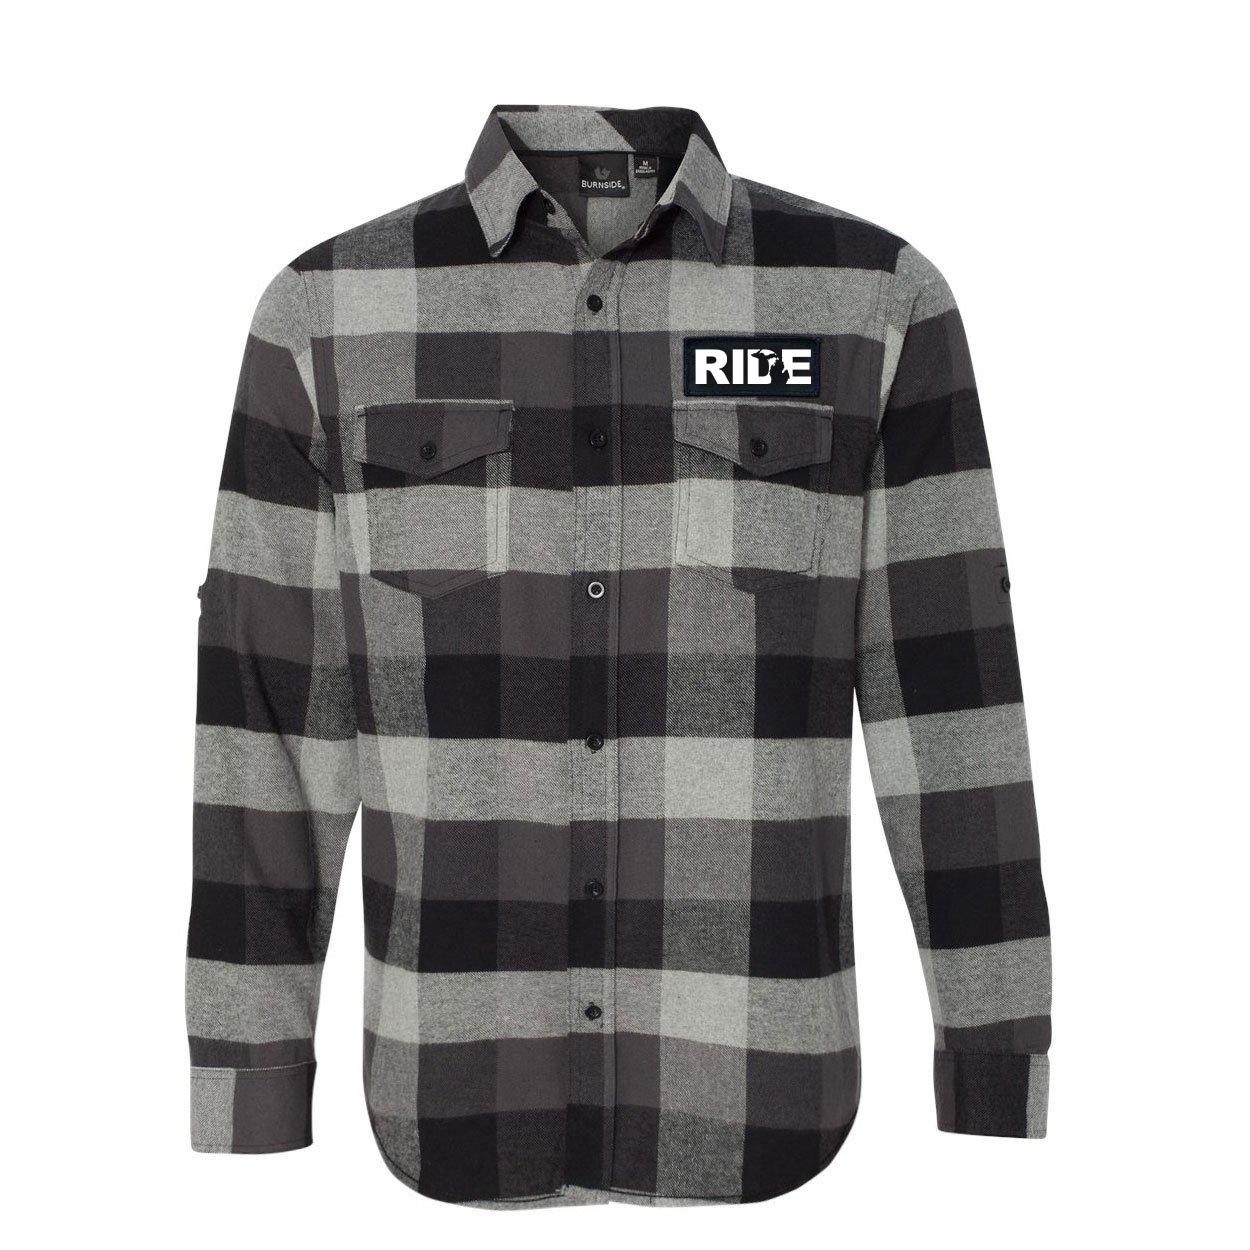 Ride Michigan Classic Unisex Long Sleeve Woven Patch Flannel Shirt Black/Gray (White Logo)